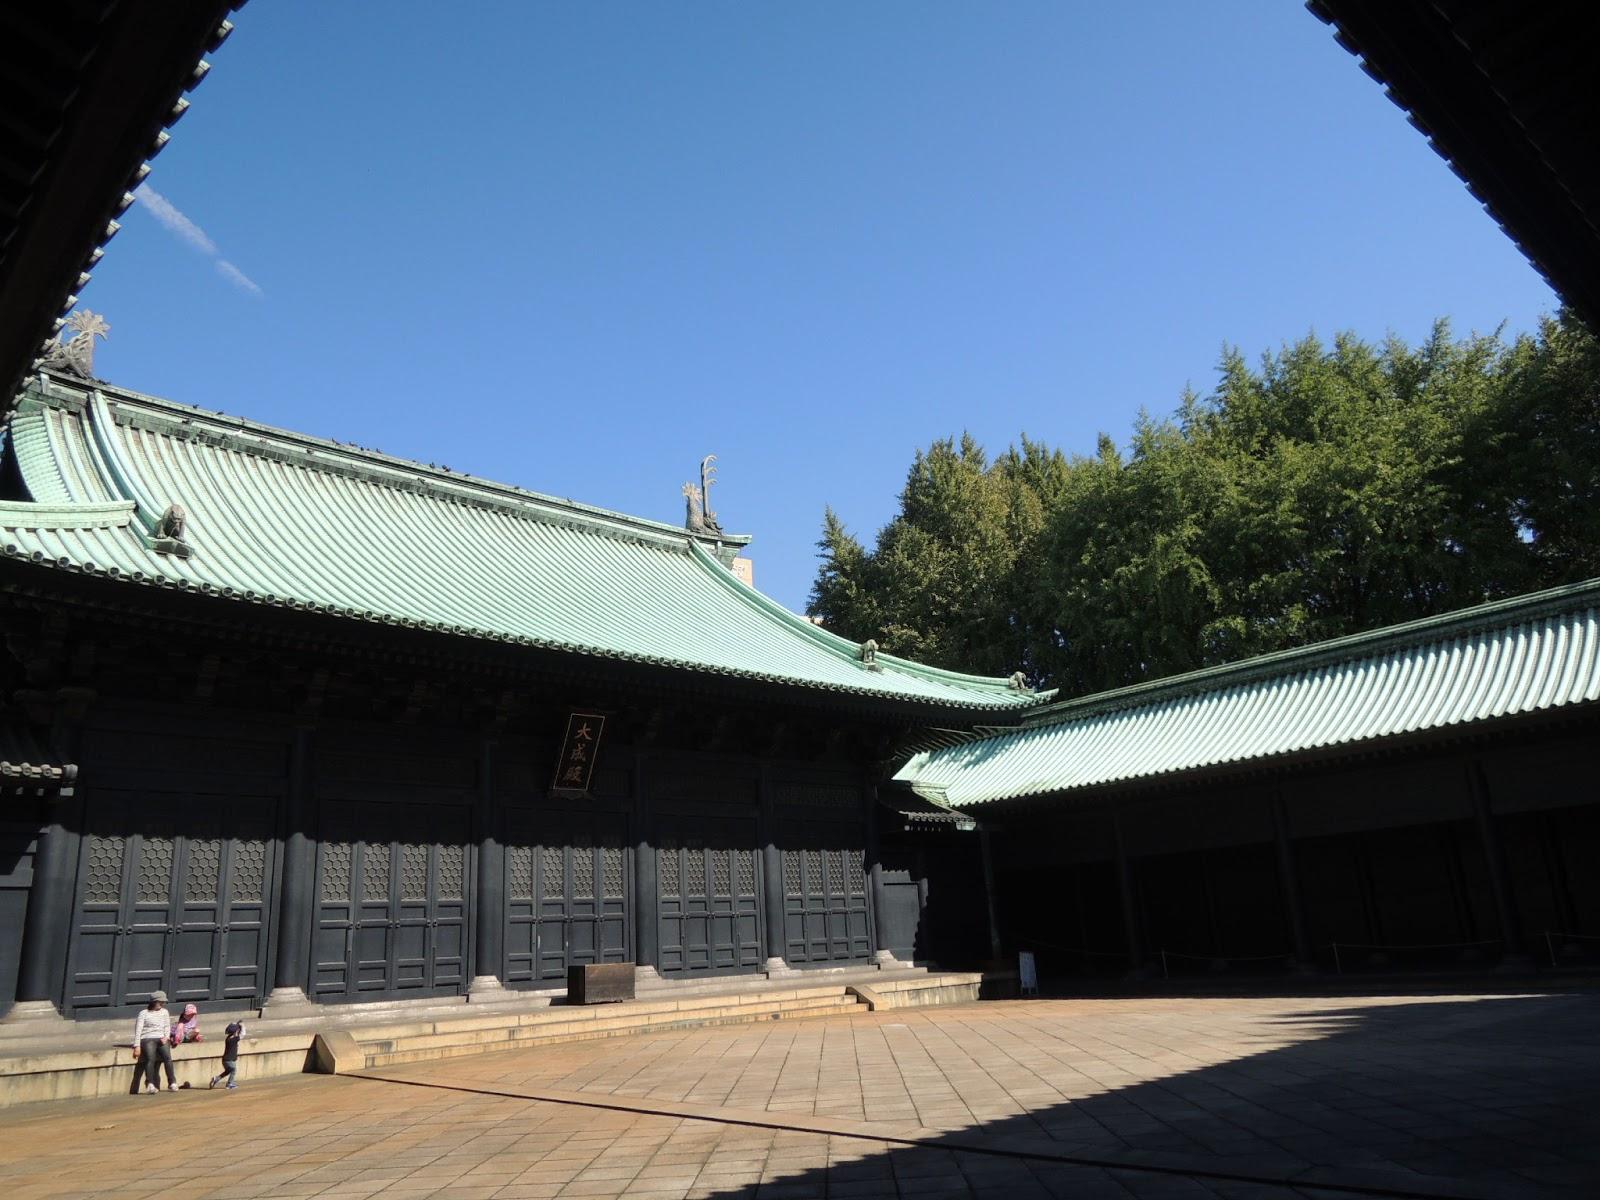 東京観光 湯島聖堂 Yushima Seido Temple